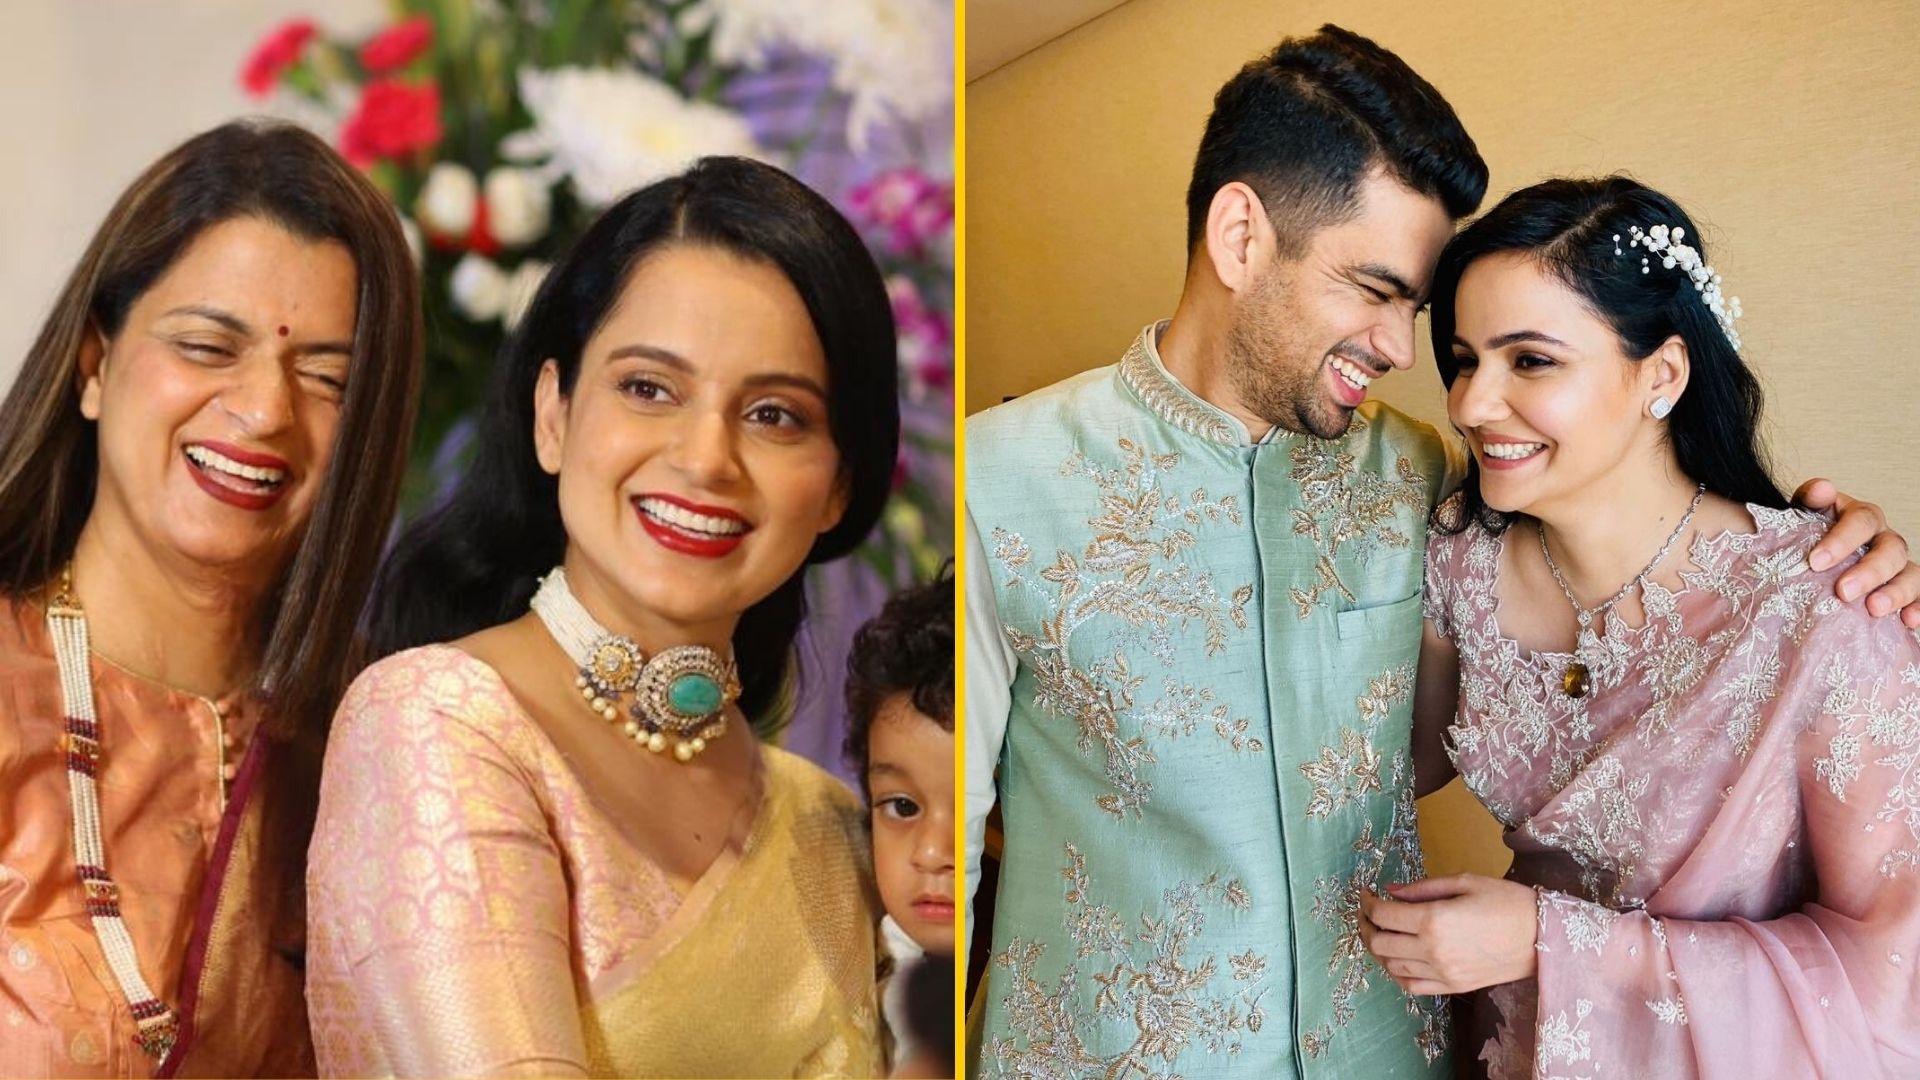 Pics: Kangana Ranaut, Rangoli Celebrate Brother's Engagement